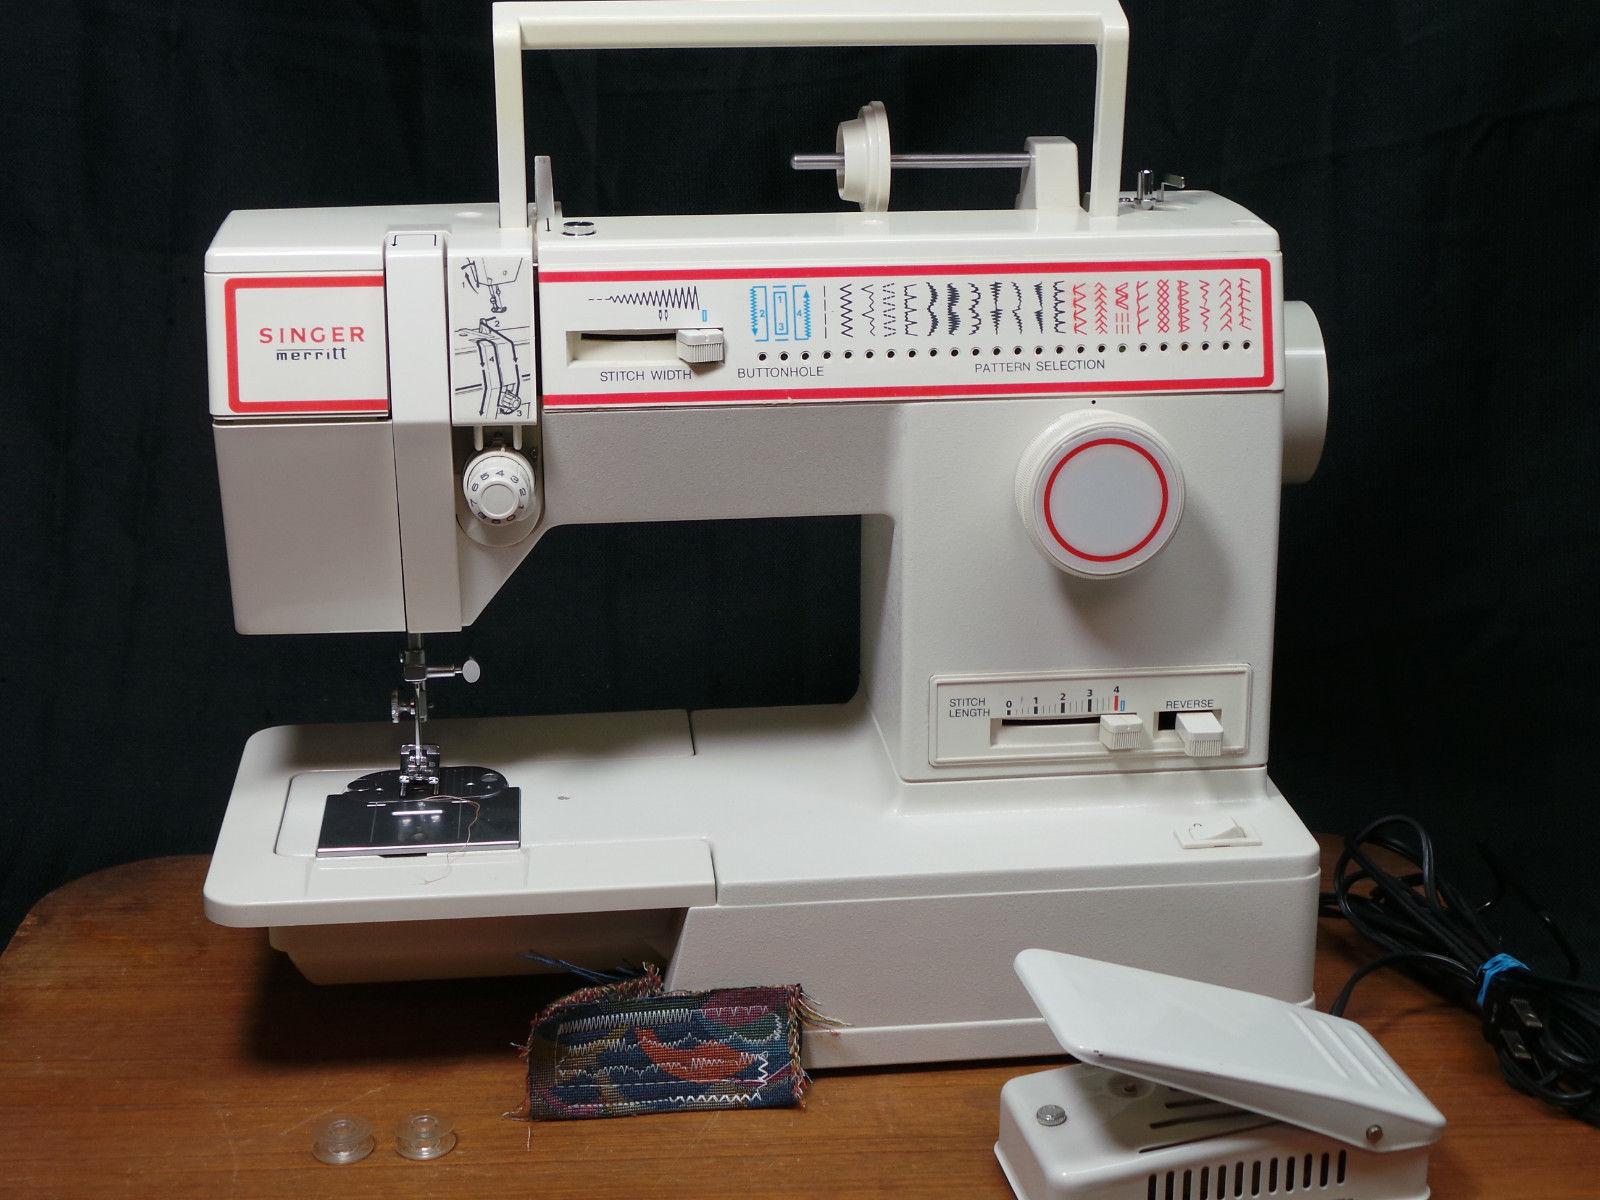 Singer Merritt 4552 Sewing Machine Portable And 12 Similar Items Necchi Supernova Threading Diagram Vintage S L1600